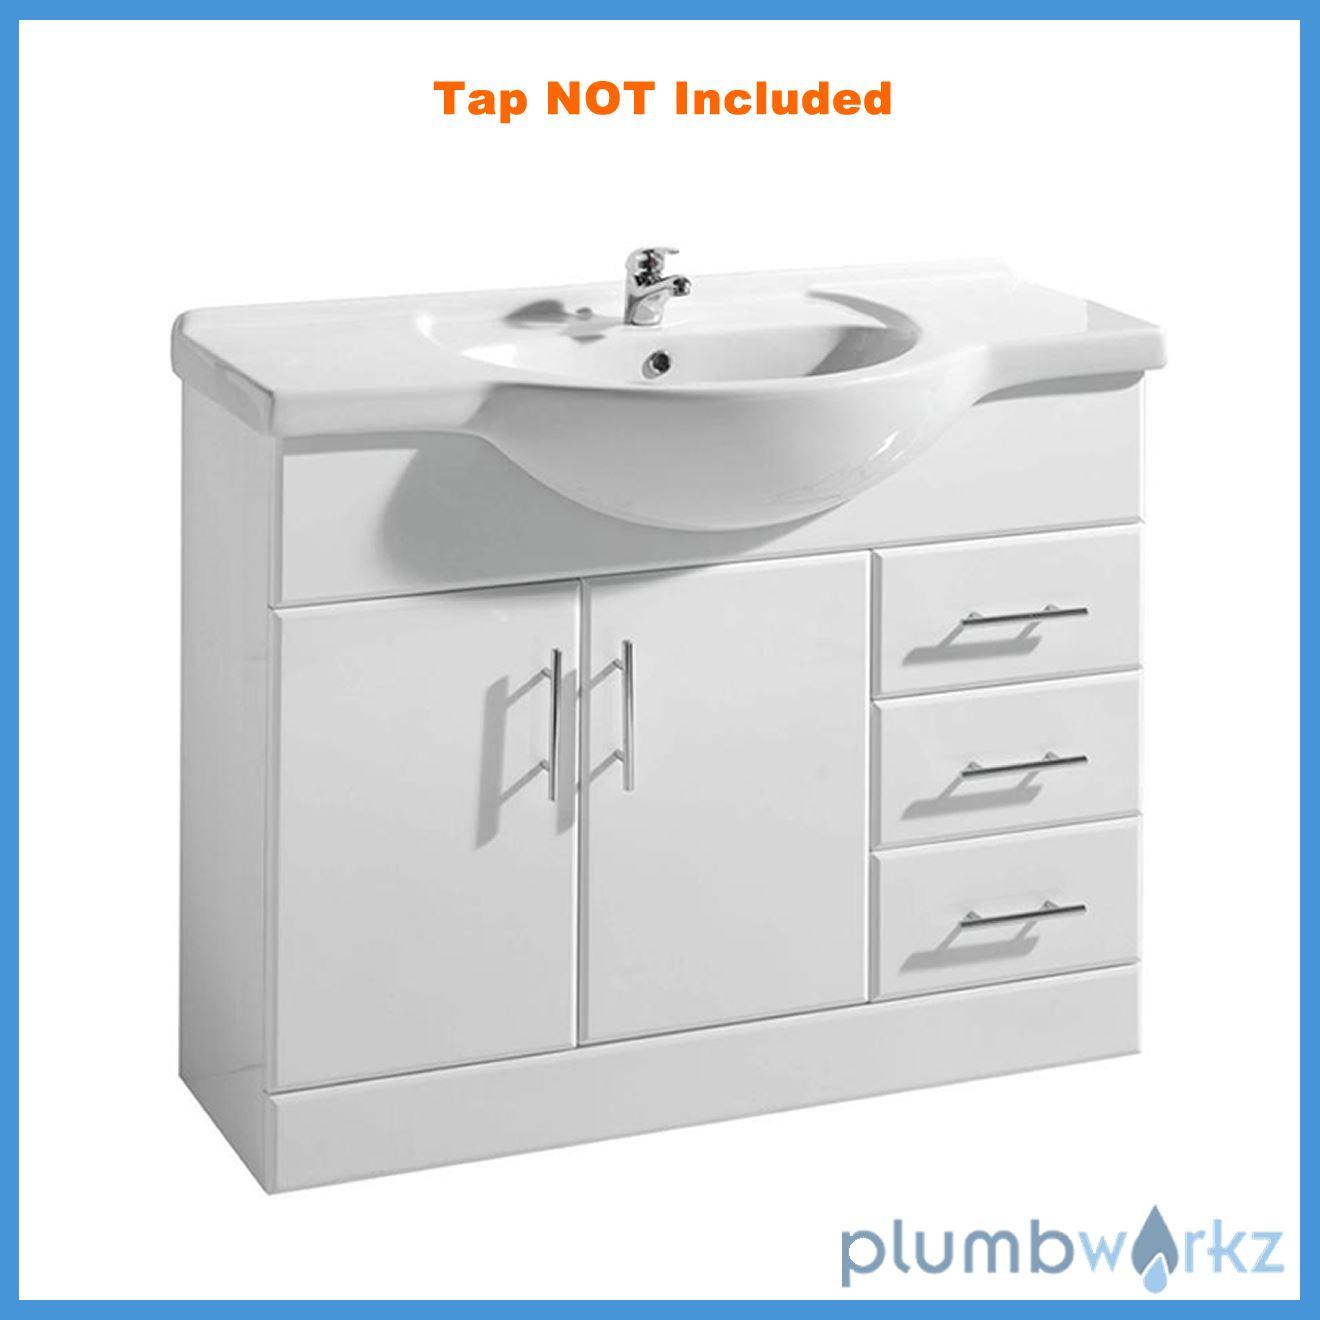 White gloss bathroom vanity unit basin sink compact - White gloss bathroom vanity unit ...